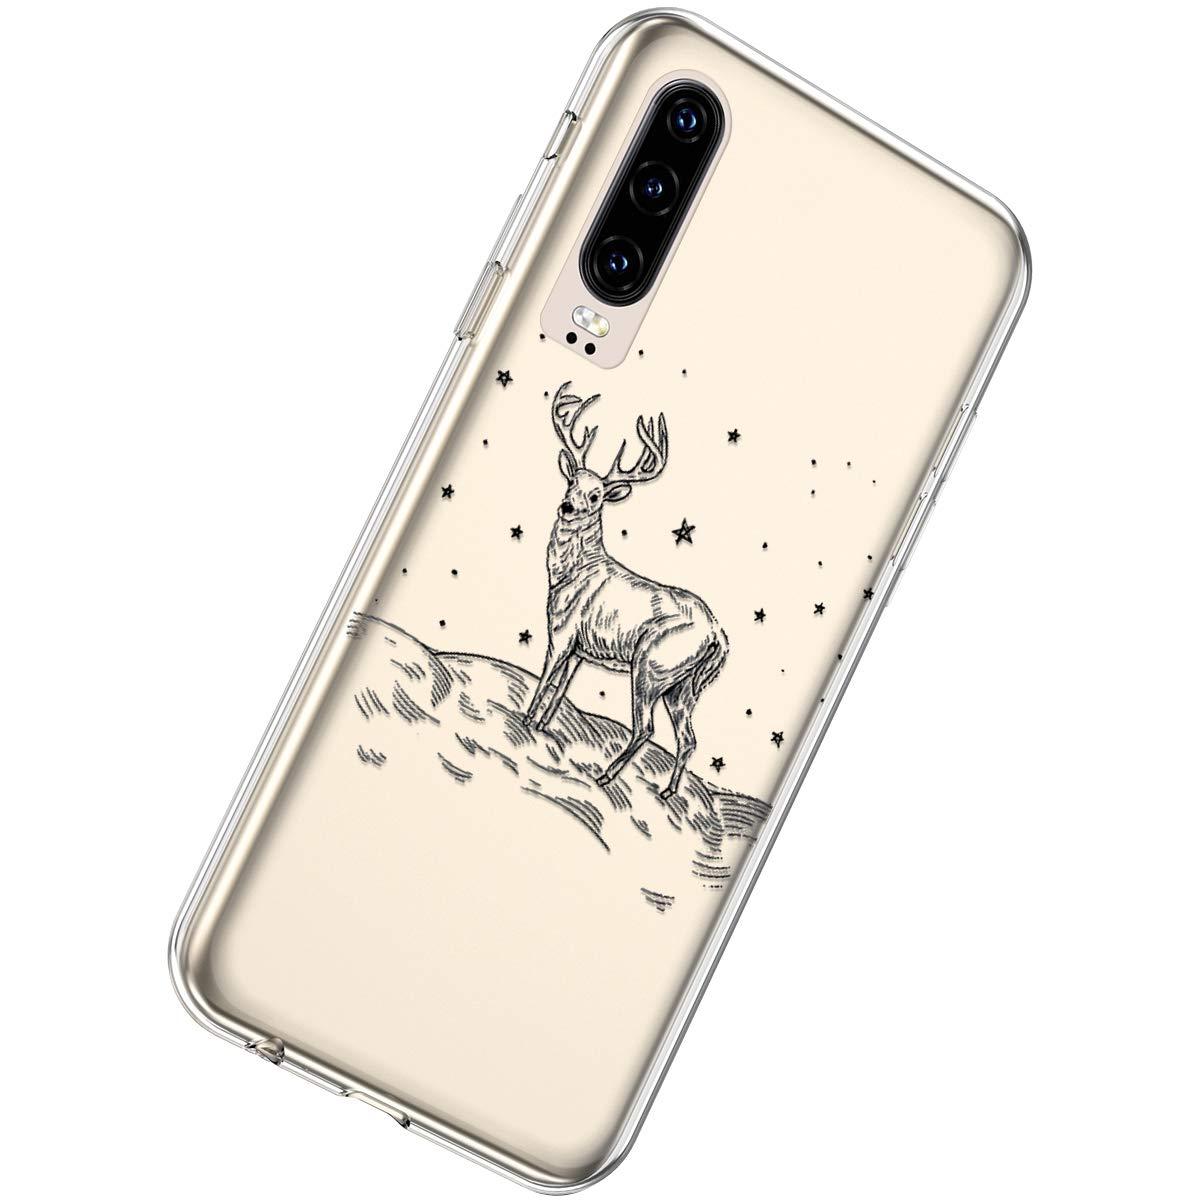 Herbests Custodia Huawei P30 Cover Trasparente Silicone Soft Custodia Sottile Crystal Clear TPU Silicone Case Fiocco di Neve Natale di Serie Cover,Fiocco di Neve